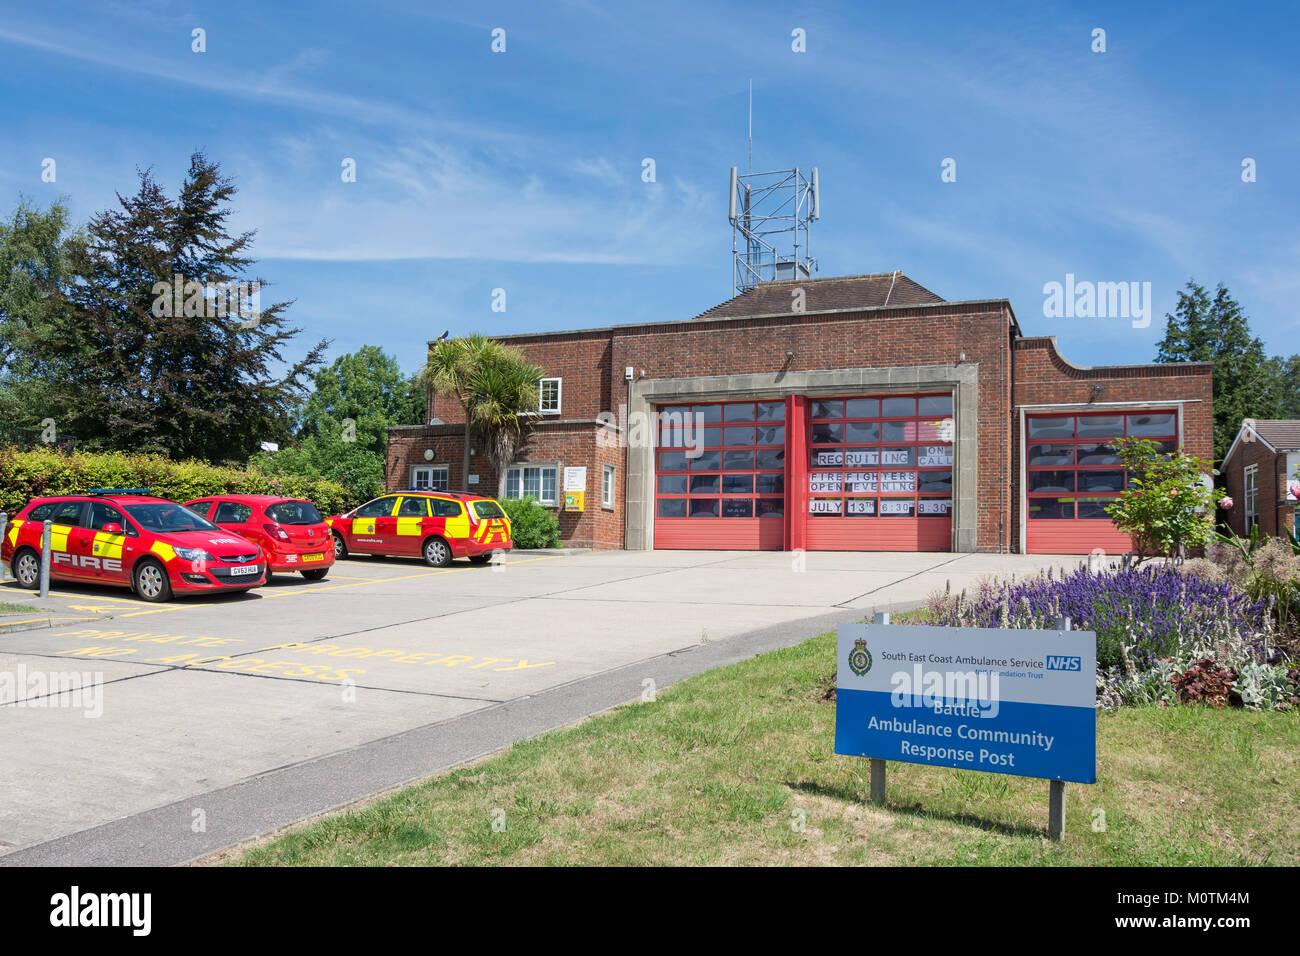 Battle Community Fire Station, High street, Battle, East Sussex, England, United Kingdom - Stock Image